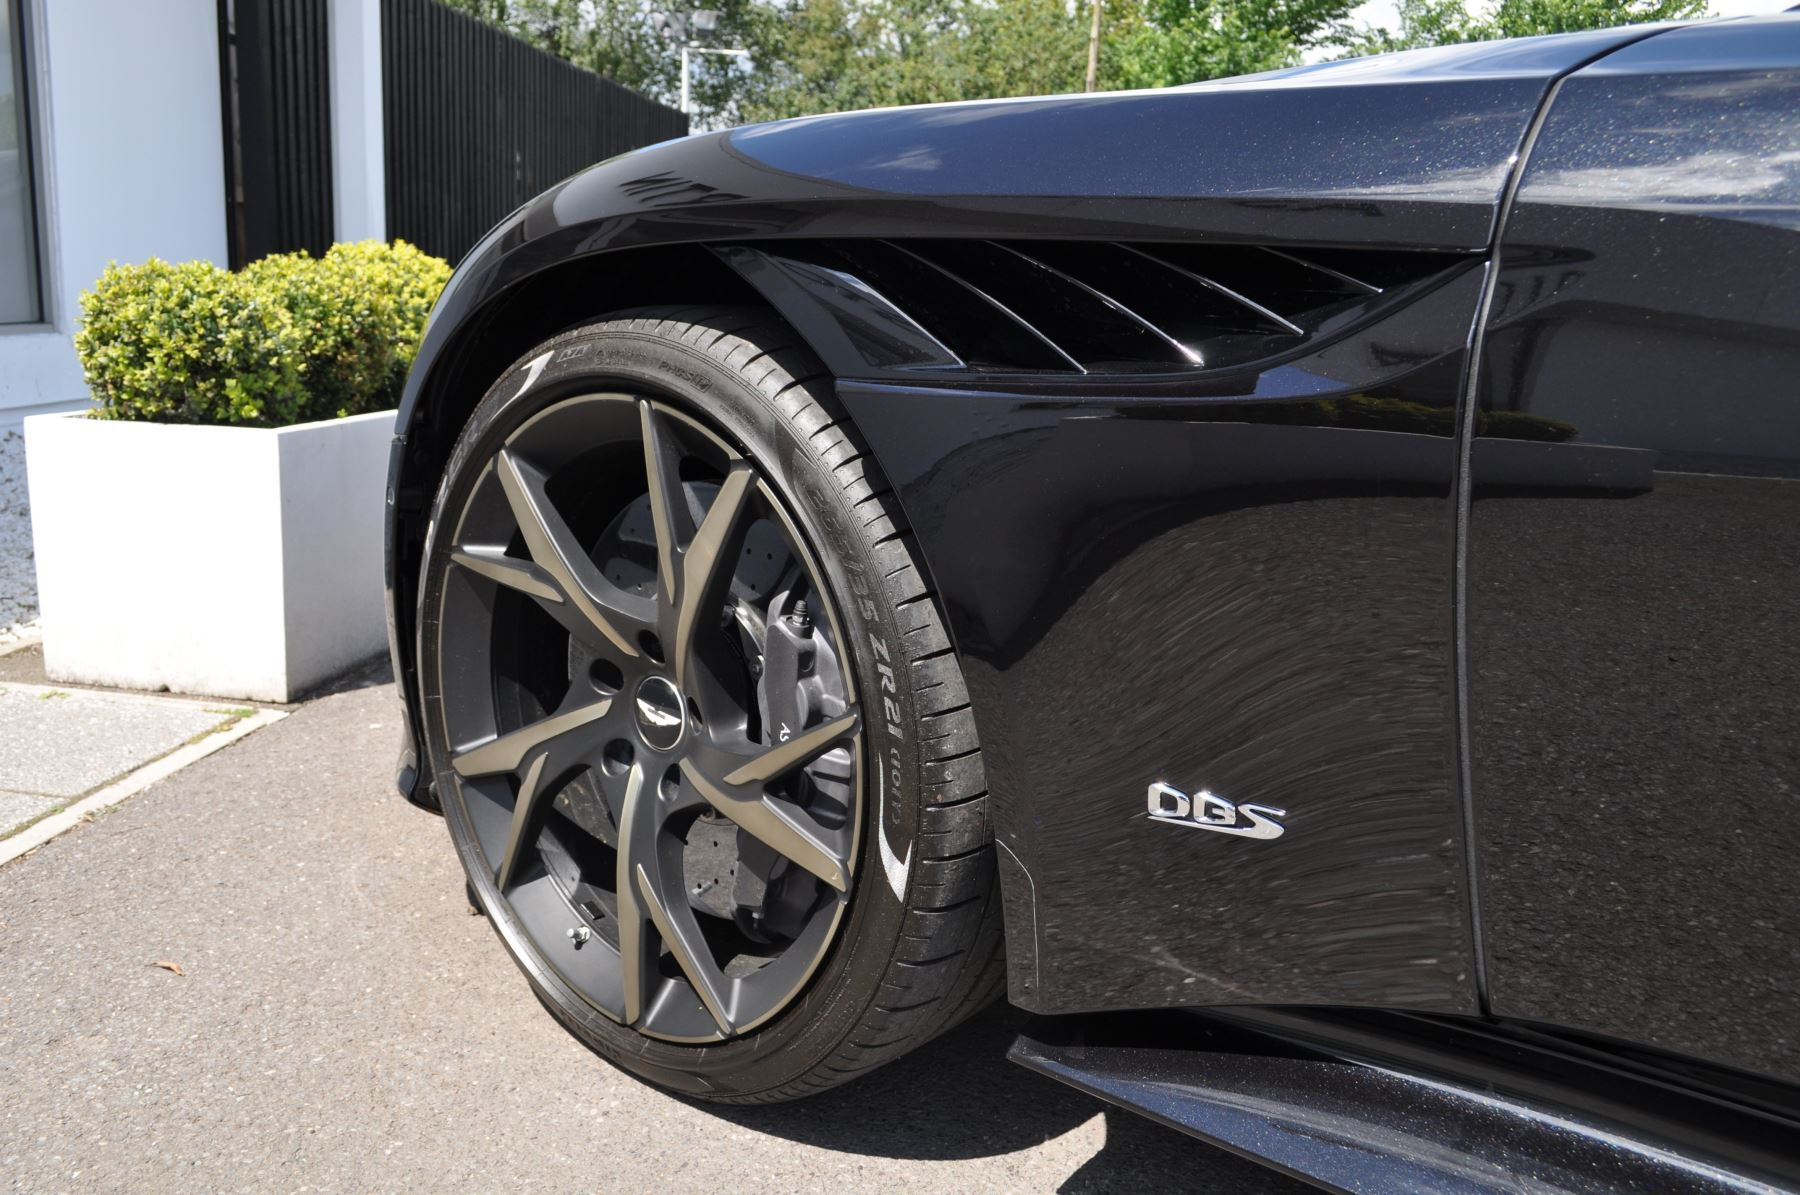 Aston Martin DBS V12 Superleggera Touchtronic image 18